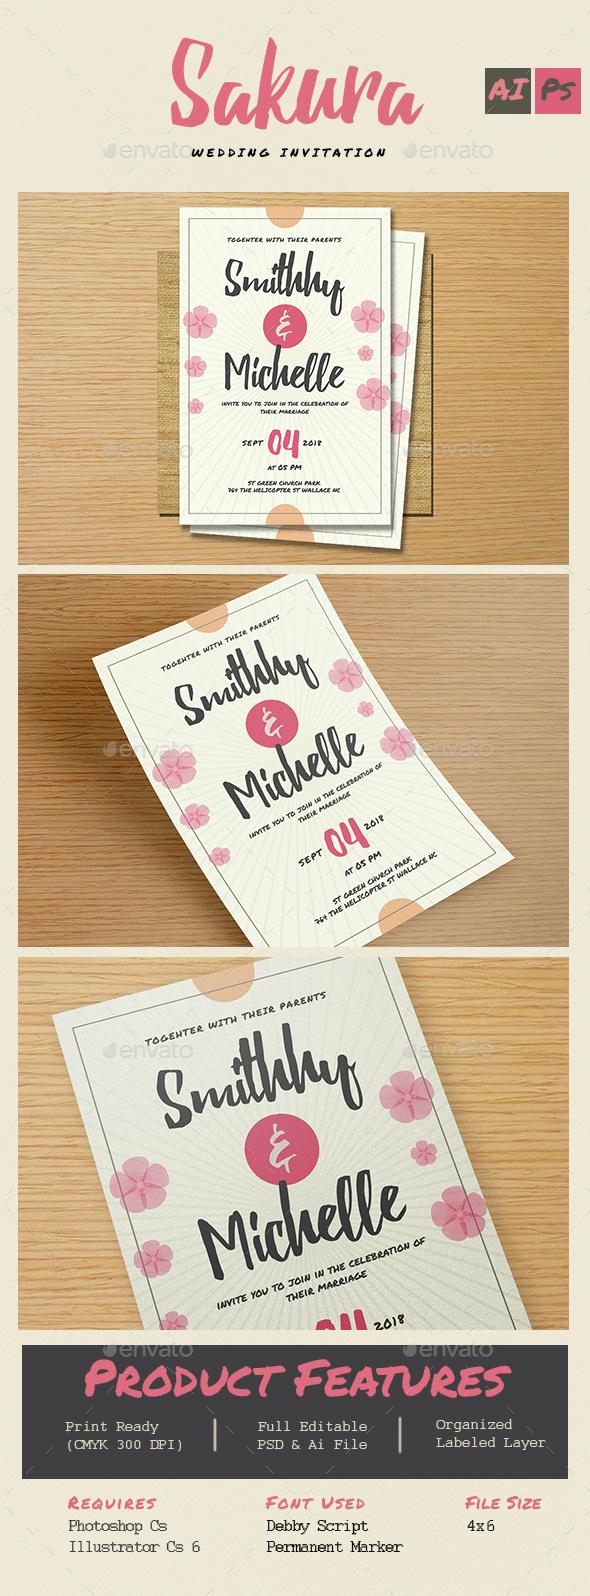 Sakura Wedding Flower Invitation